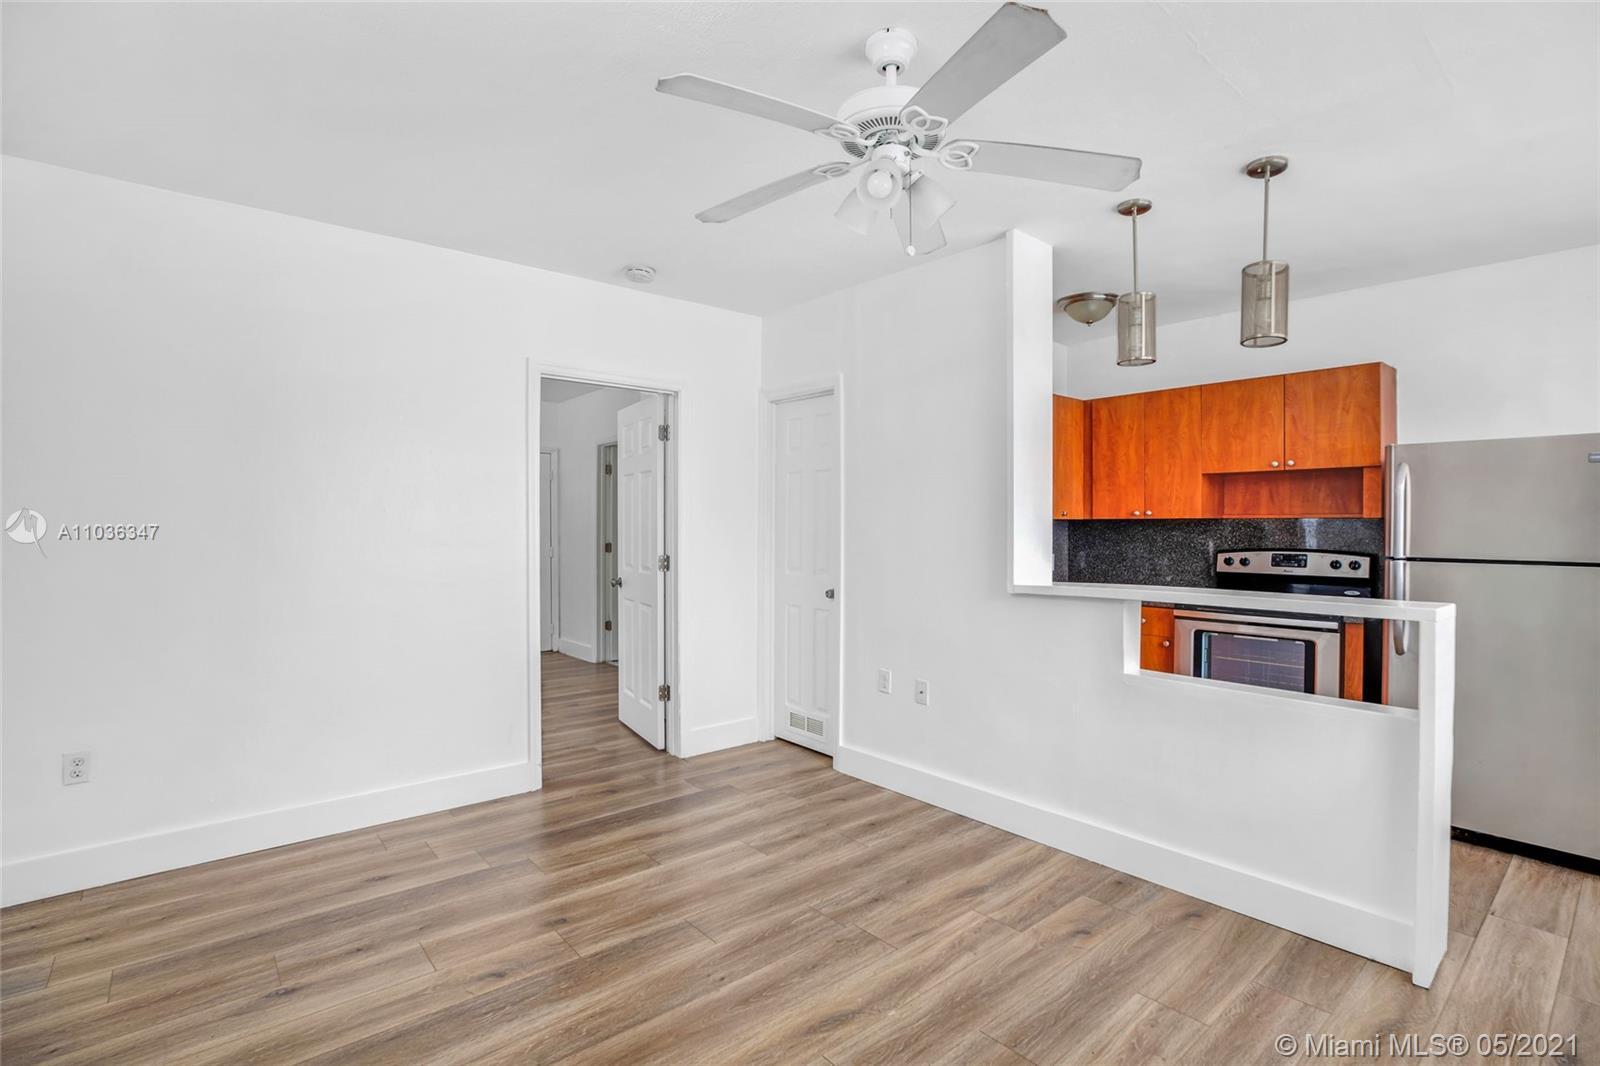 /  2464 sq. ft. $ 2021-05-03 0 Photo